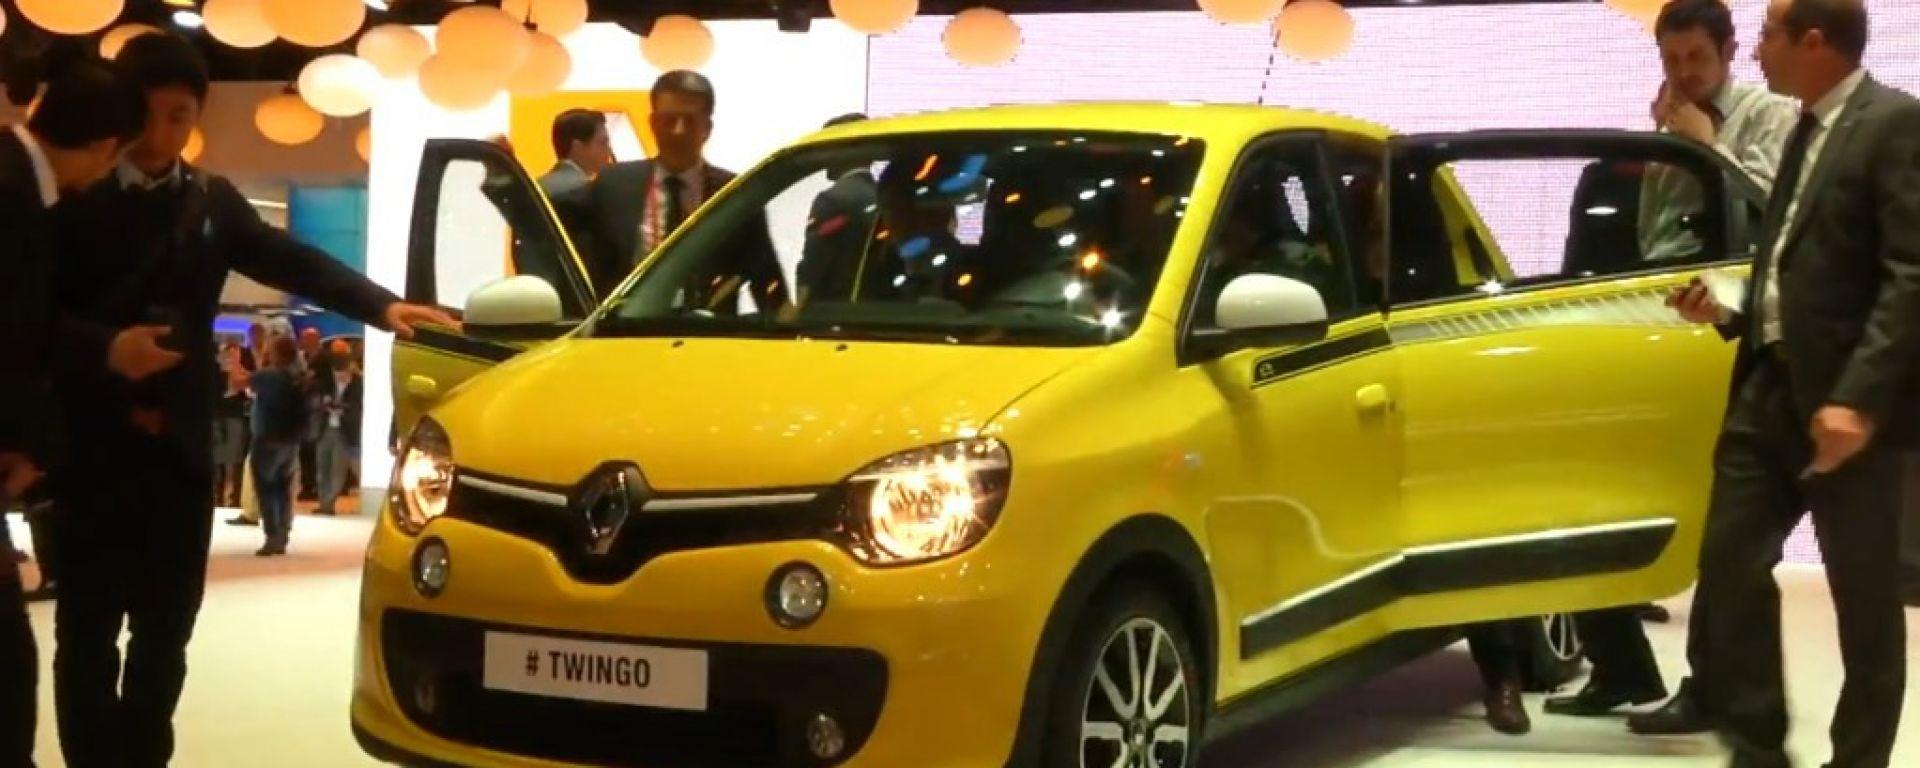 Salone di Ginevra 2014, lo stand Renault